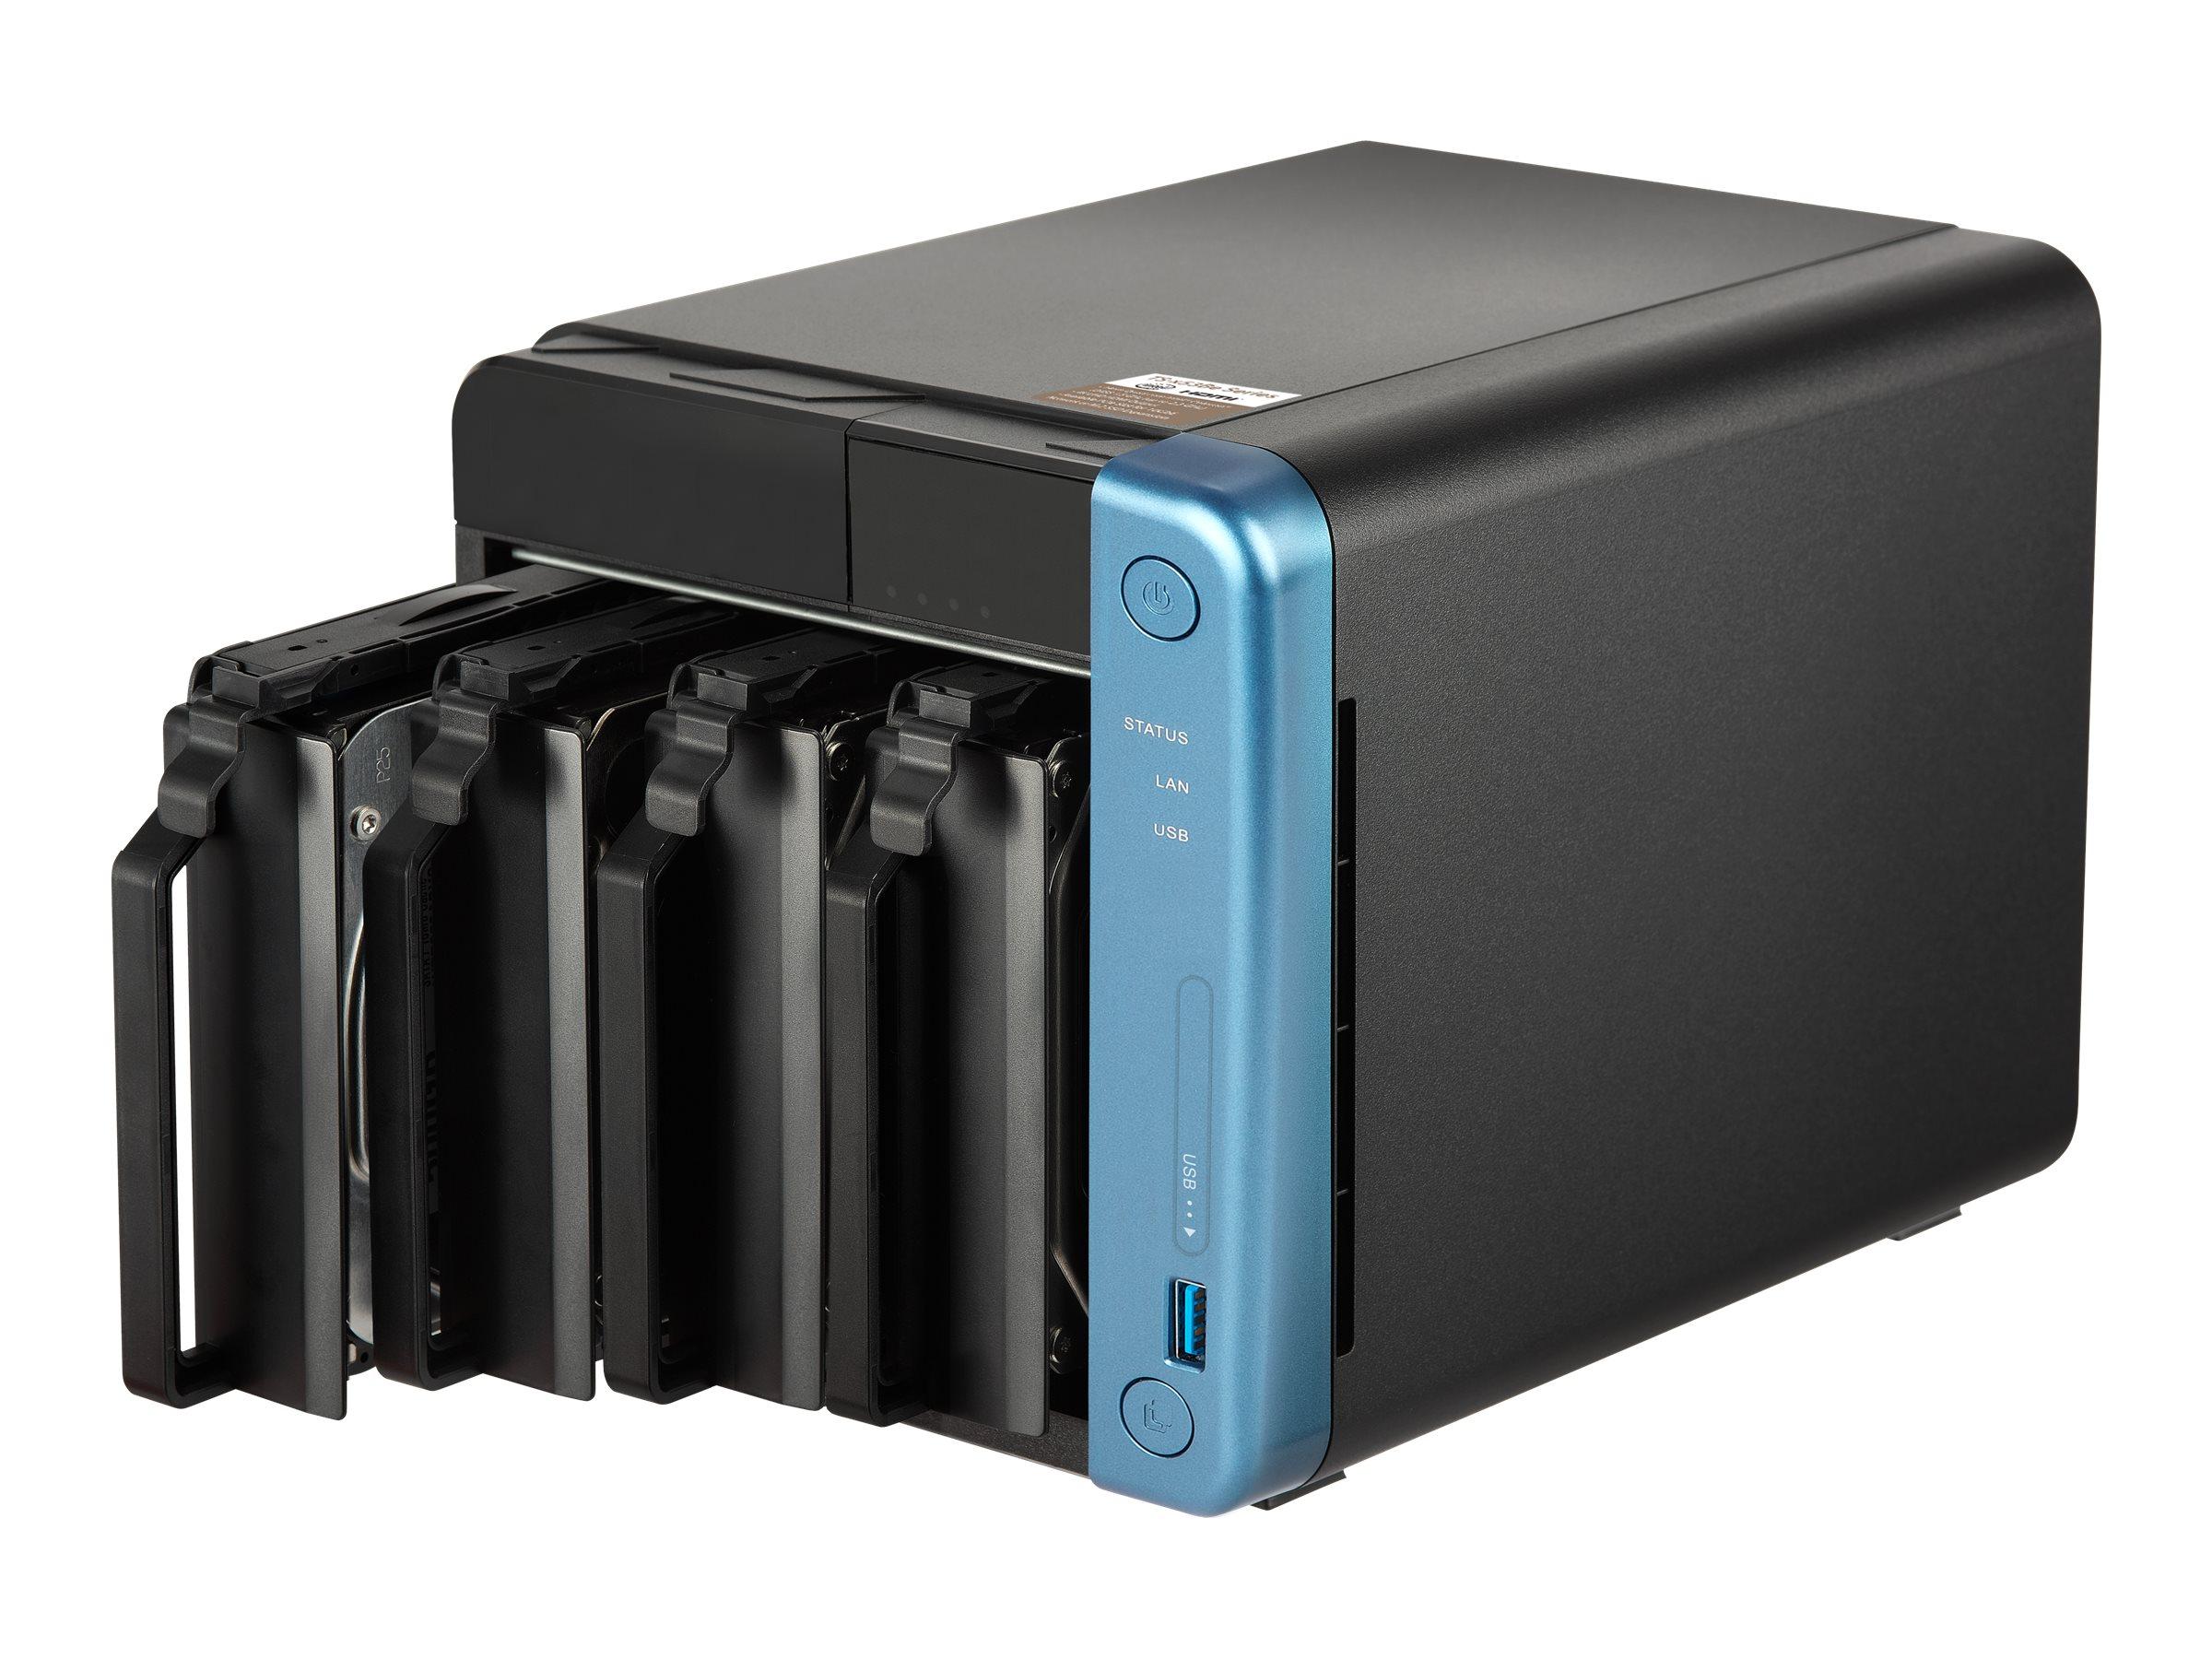 QNAP TS-453Be-2G - NAS-Server - 4 Schächte - SATA 6Gb/s